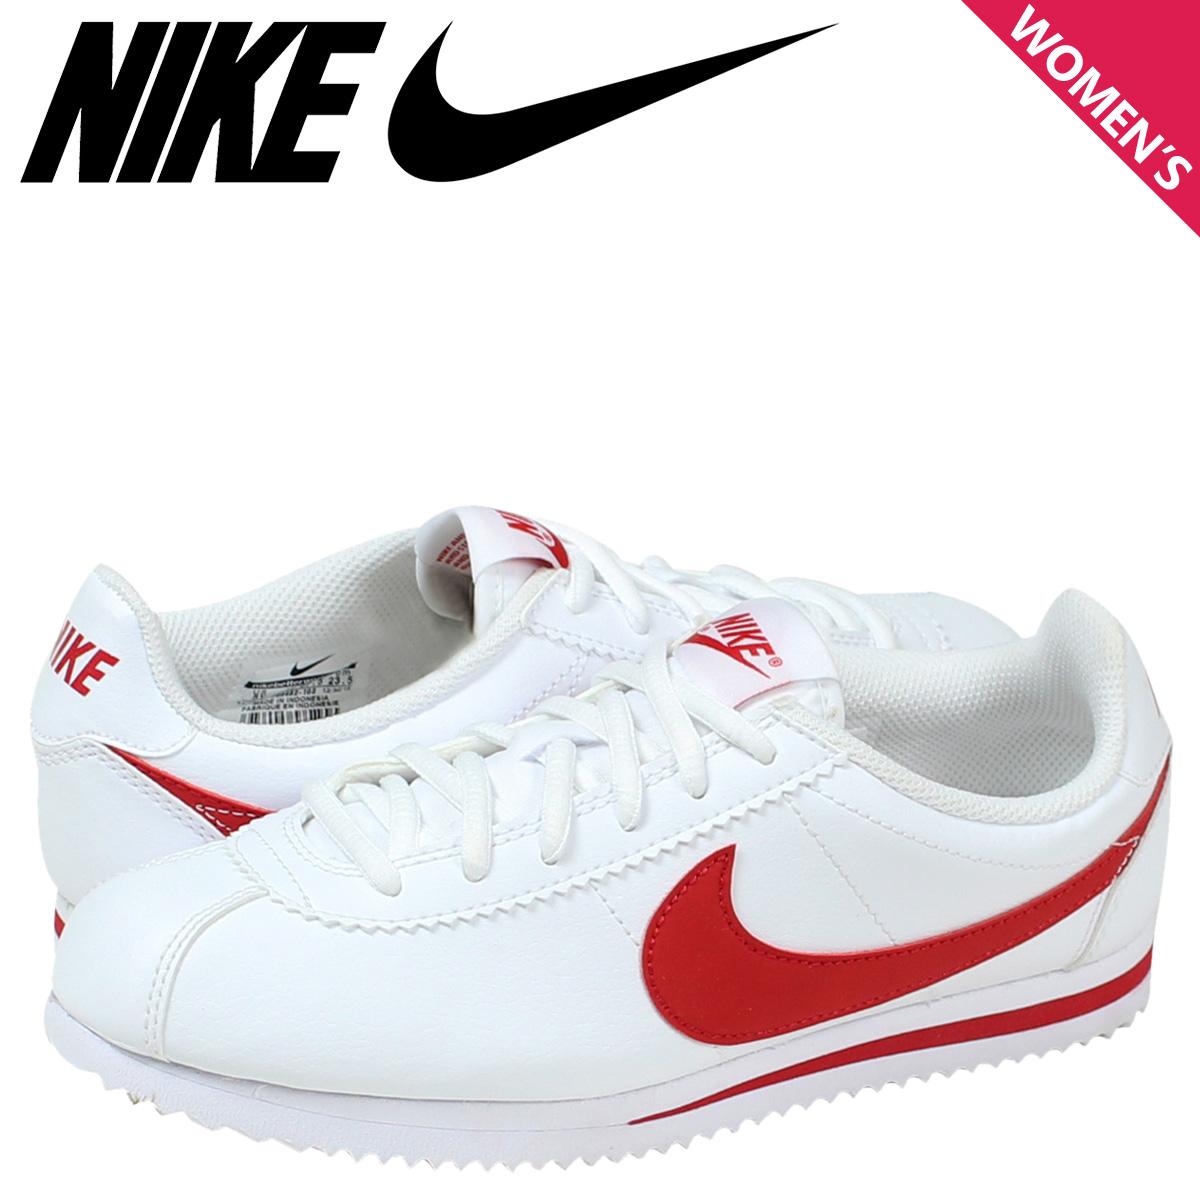 separation shoes c0ef6 2b6b4 Sugar Online Shop Nike NIKE Cortez sneakers Womens CORTEZ GS 749482-103  shoes white  Rakuten Global Market